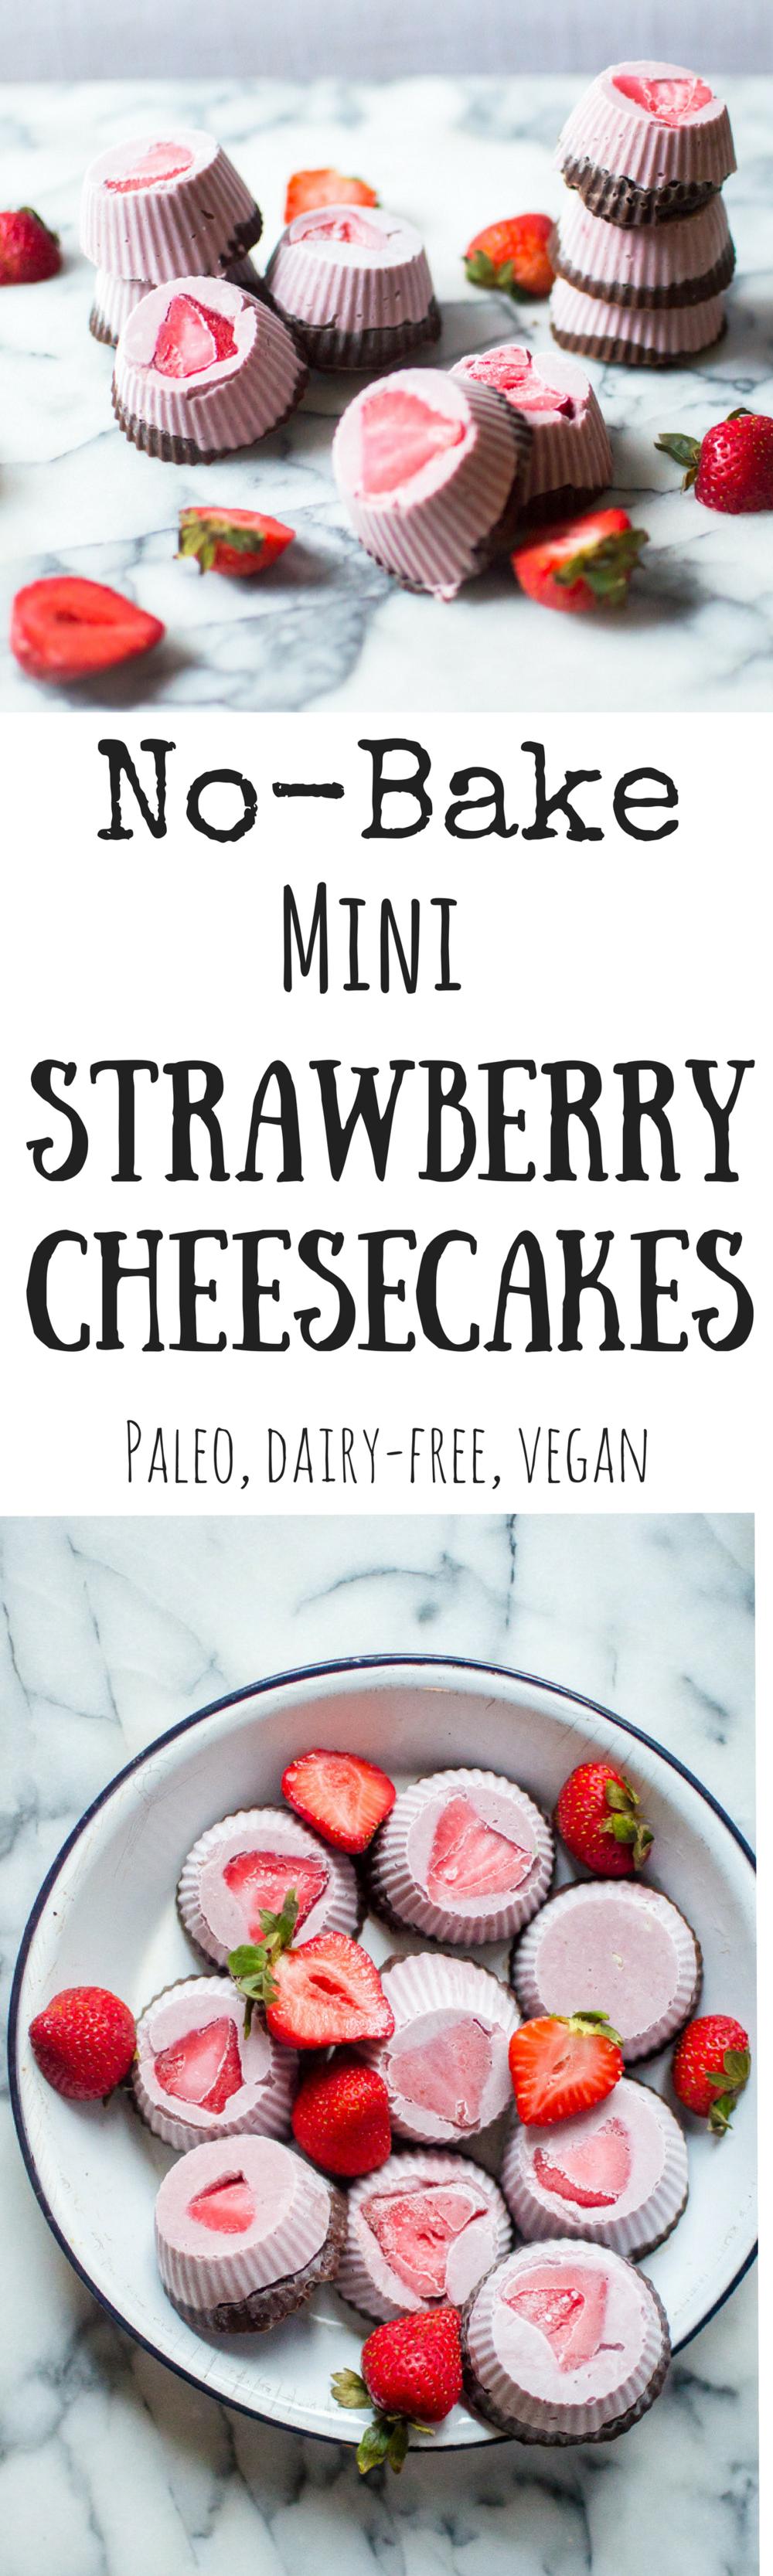 No-Bake Mini Strawberry Cheesecakes (Paleo, plant based)